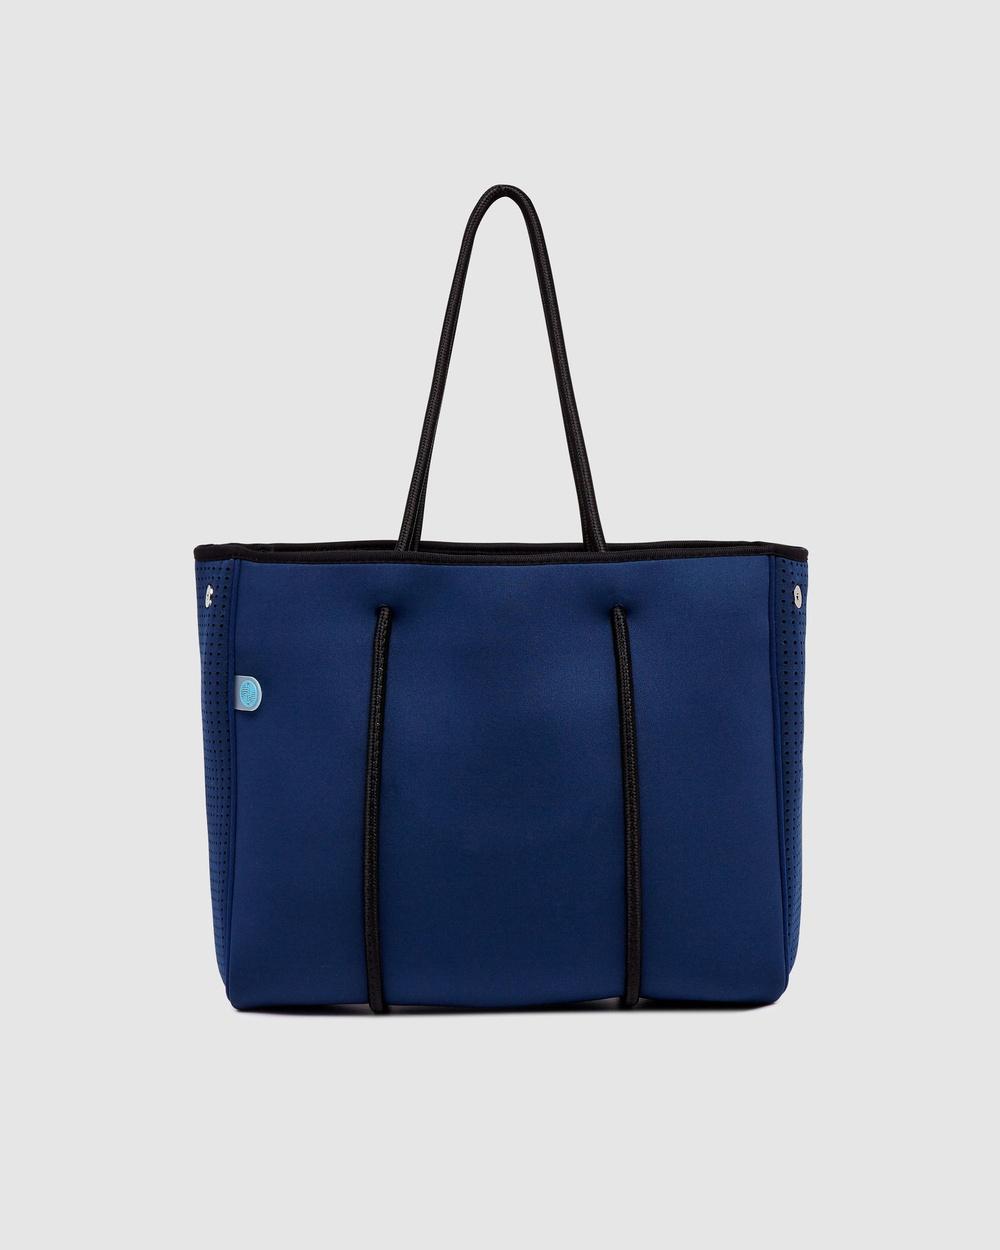 Chuchka Joanna Mini Tote Bag Handbags Navy